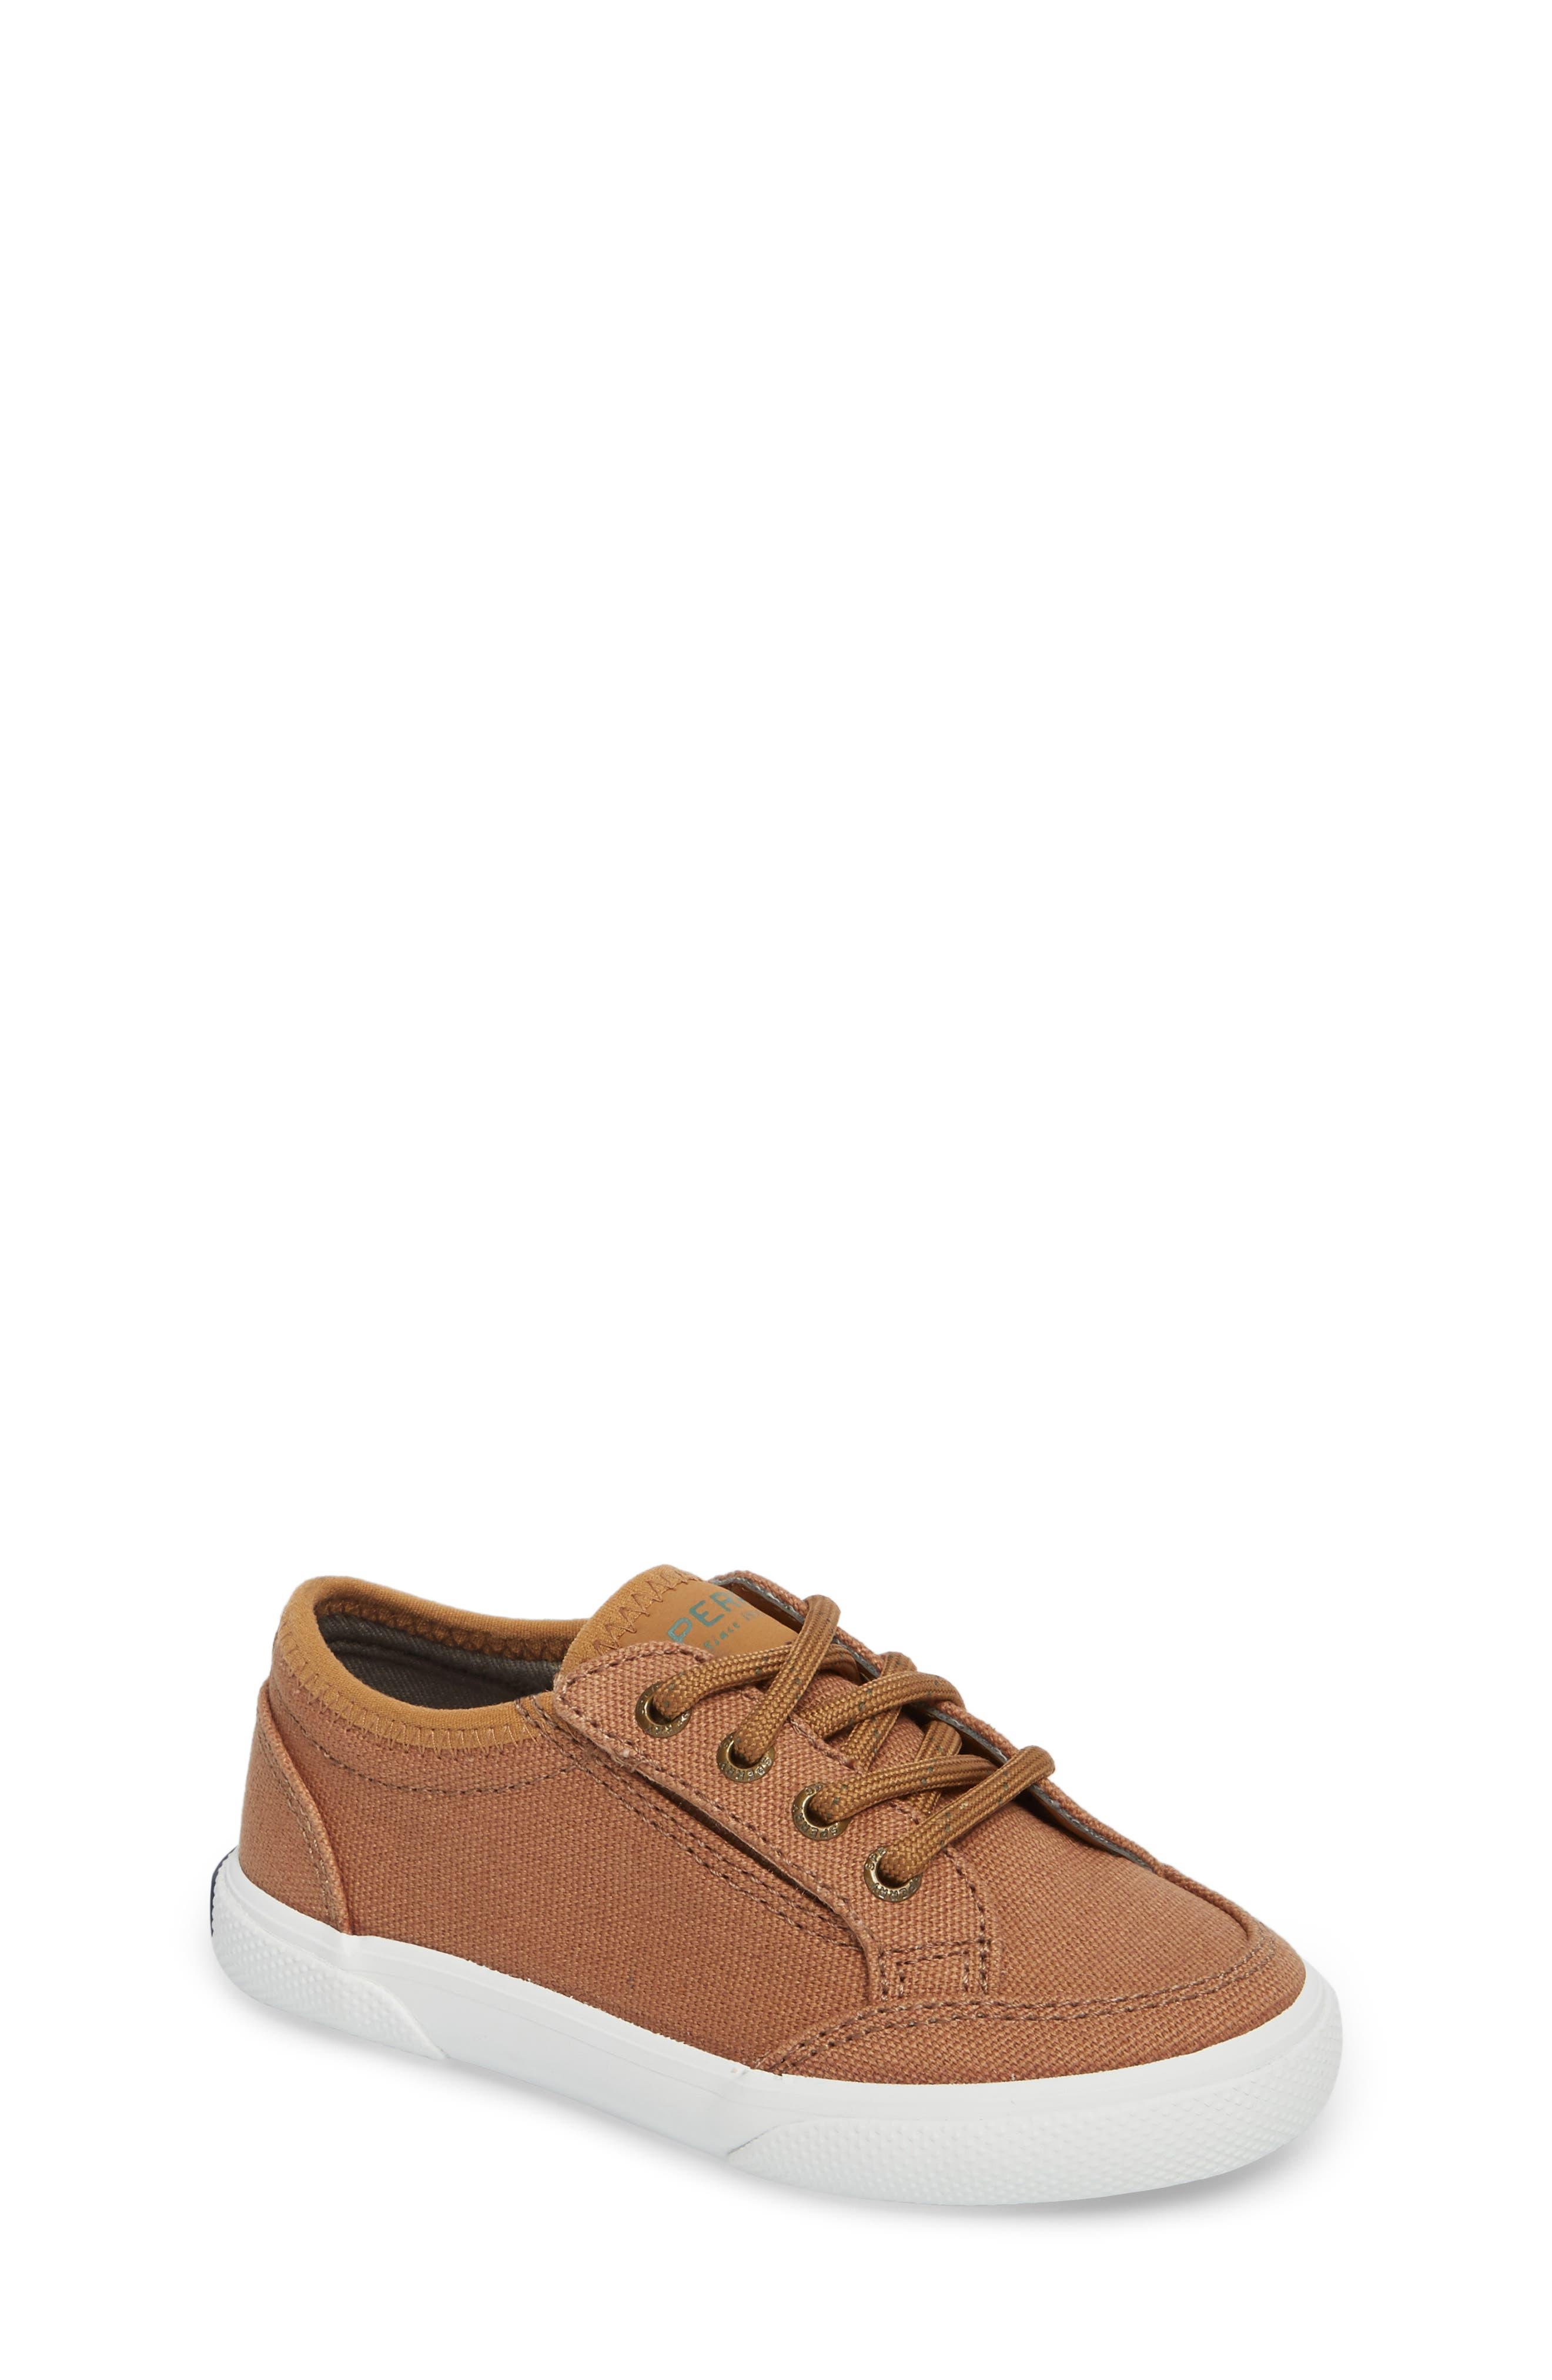 Sperry Deckfin Jr. Sneaker,                         Main,                         color,